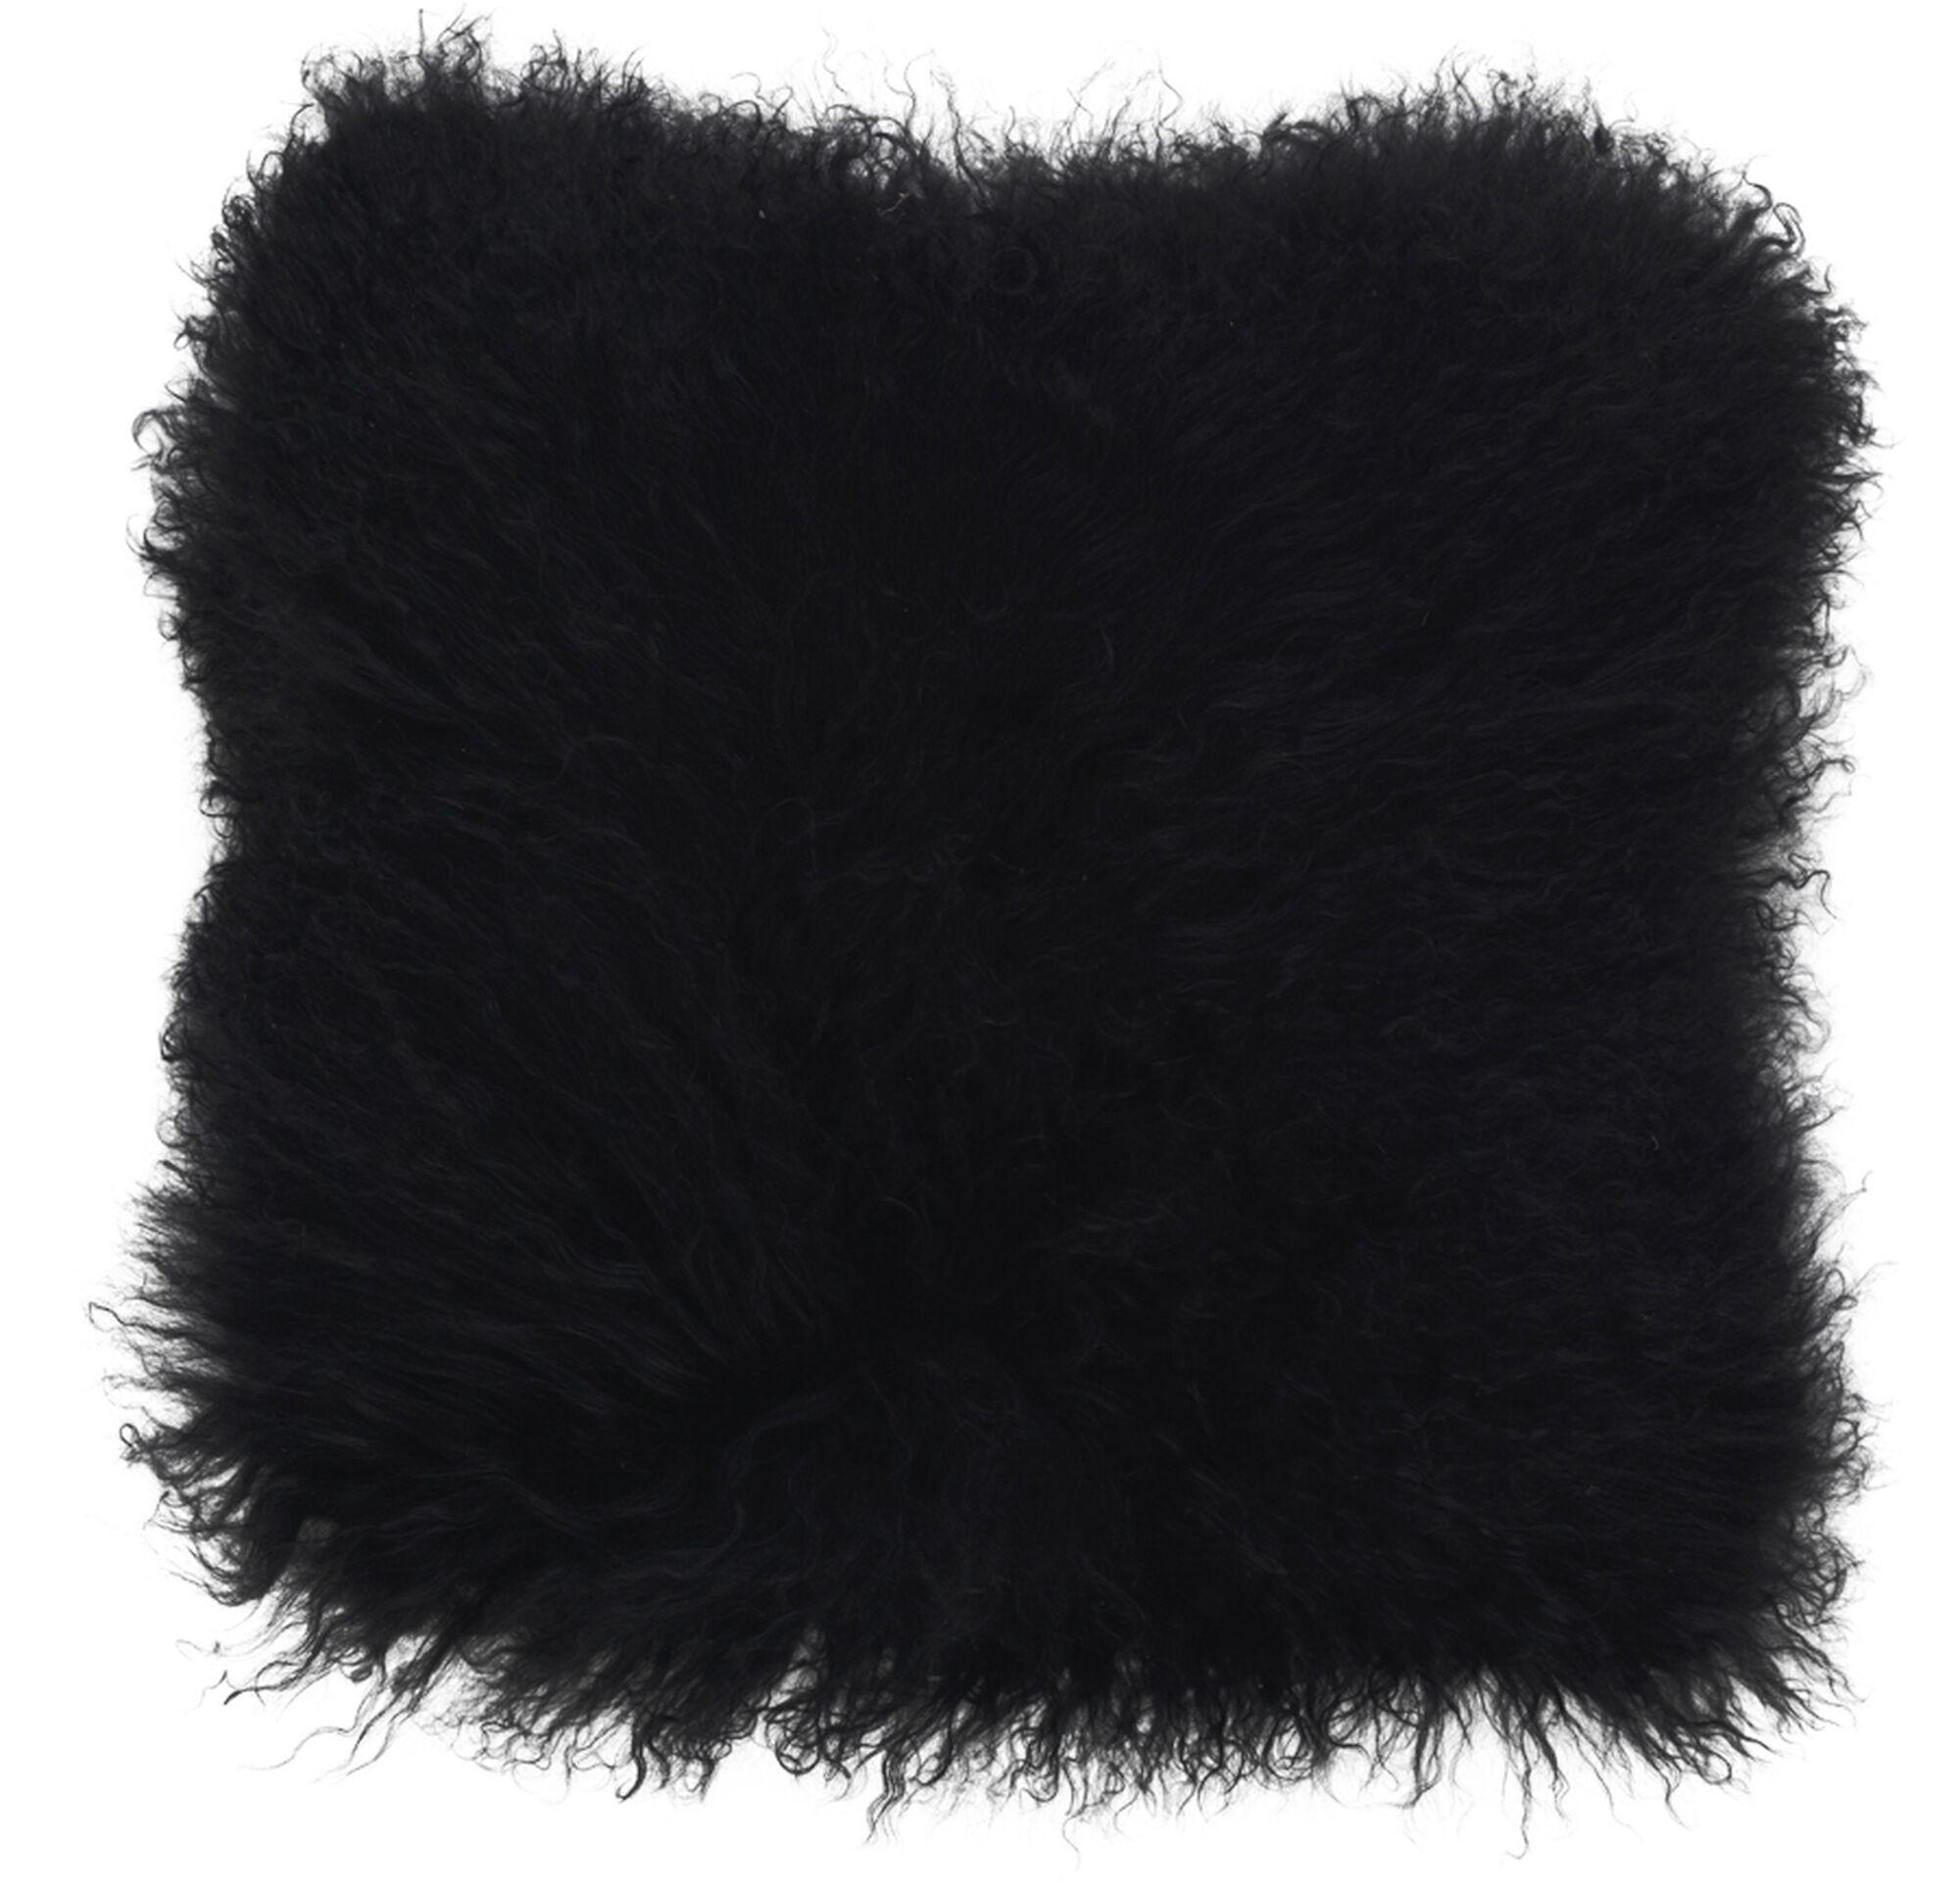 black pillow pillows and white key via contemporary pin etsy cover decorative geometric throw greek